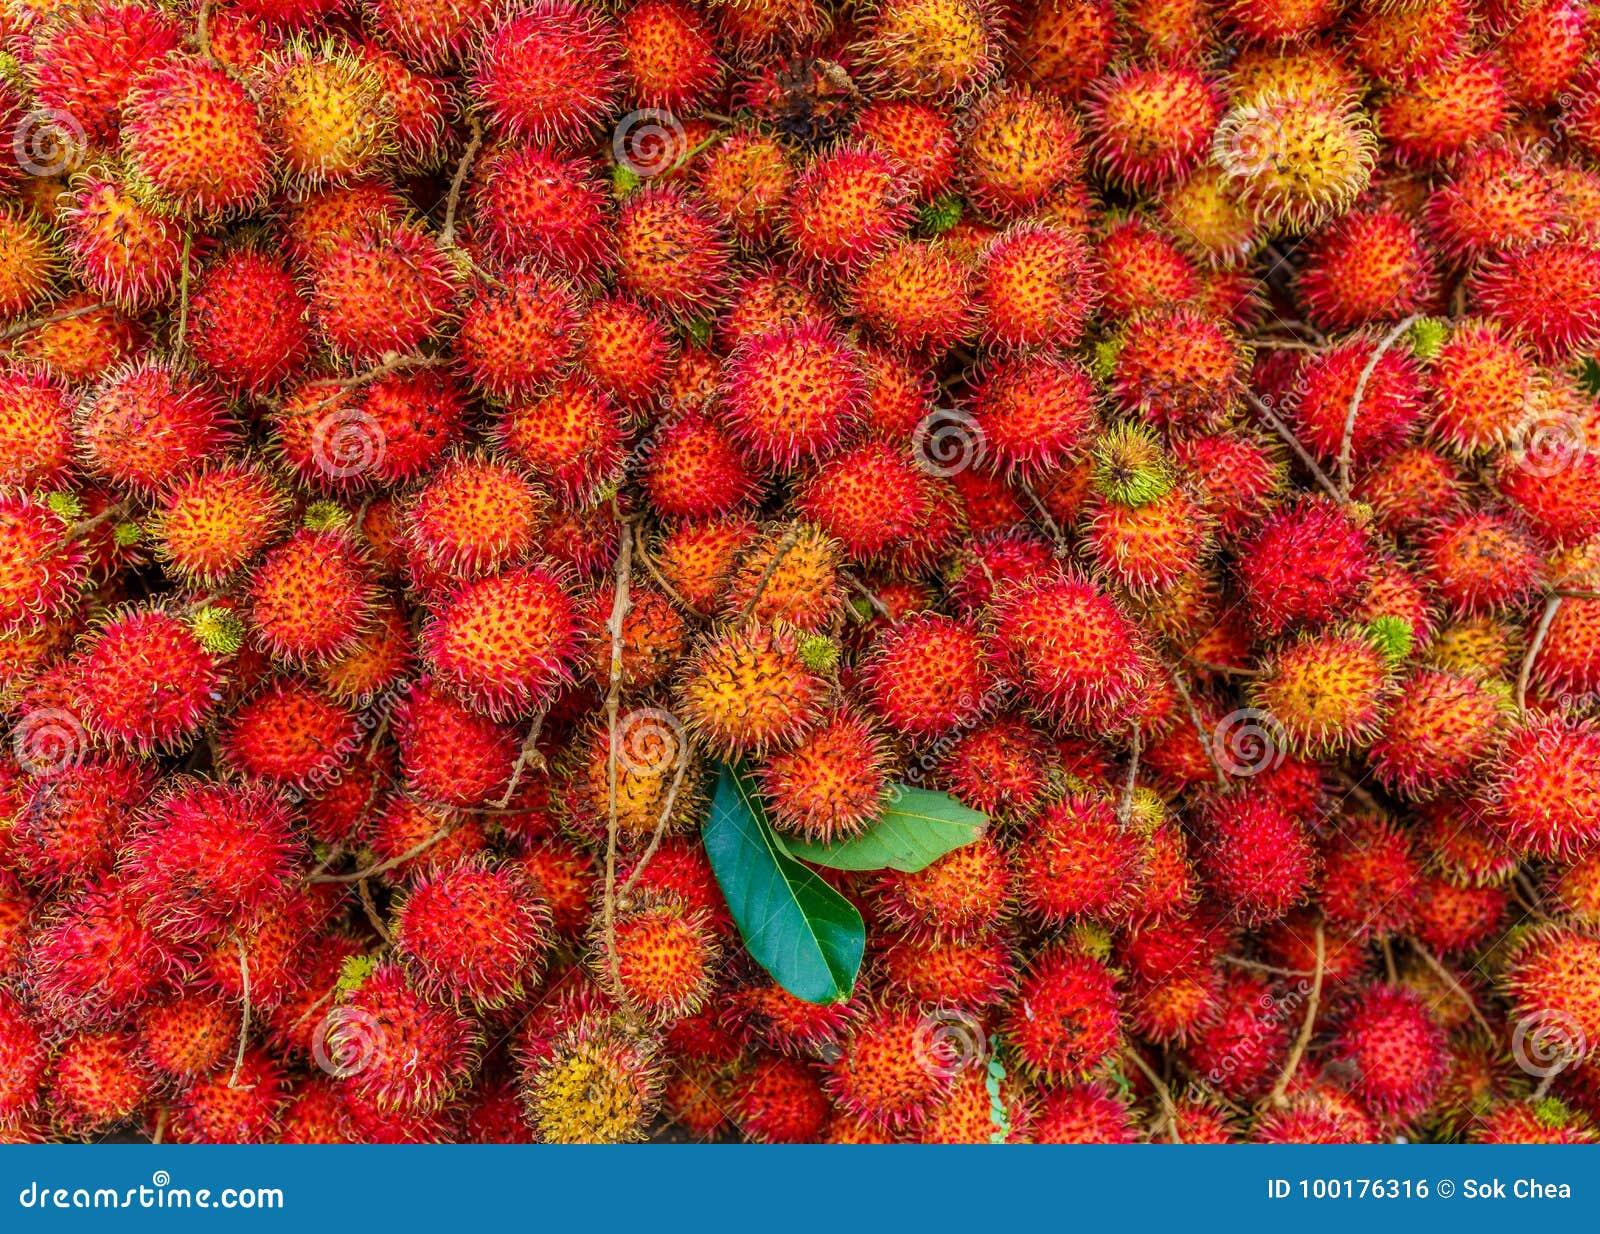 Fresh Ripe Rambutan the Popular Juicy Sweet Tropical Fruit Serving as Healthy Food